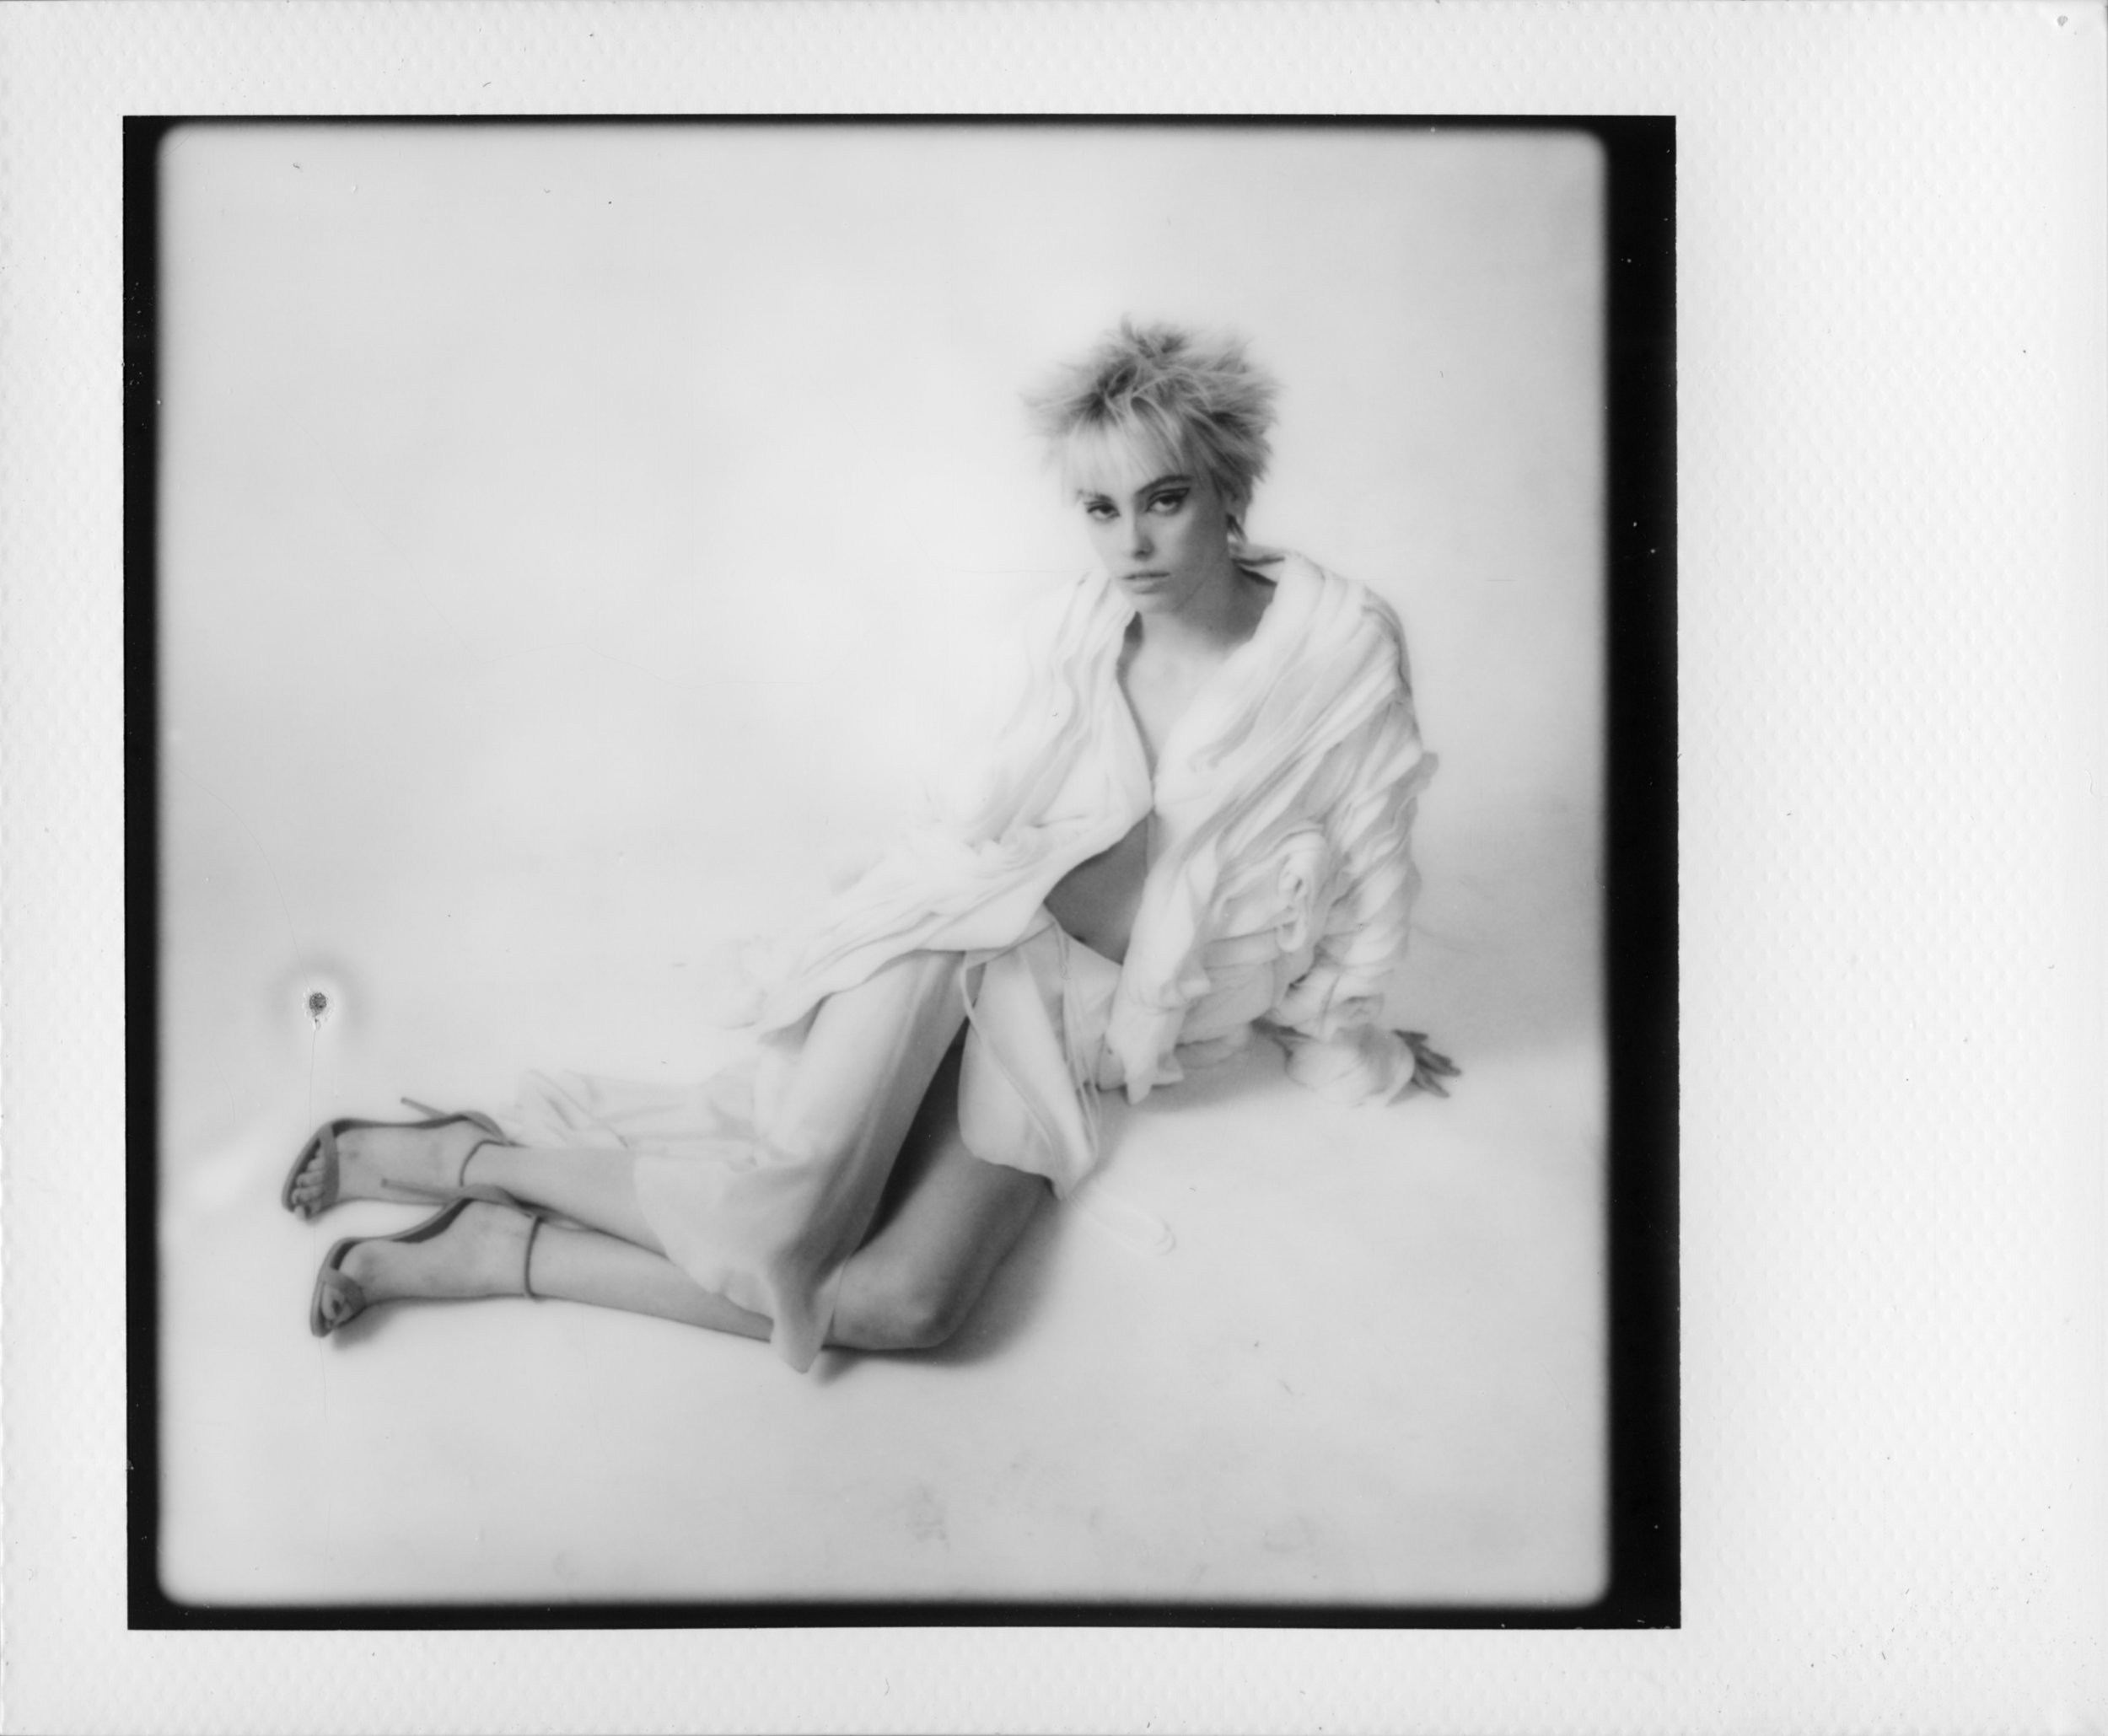 Chiara Polaroid 001.jpg